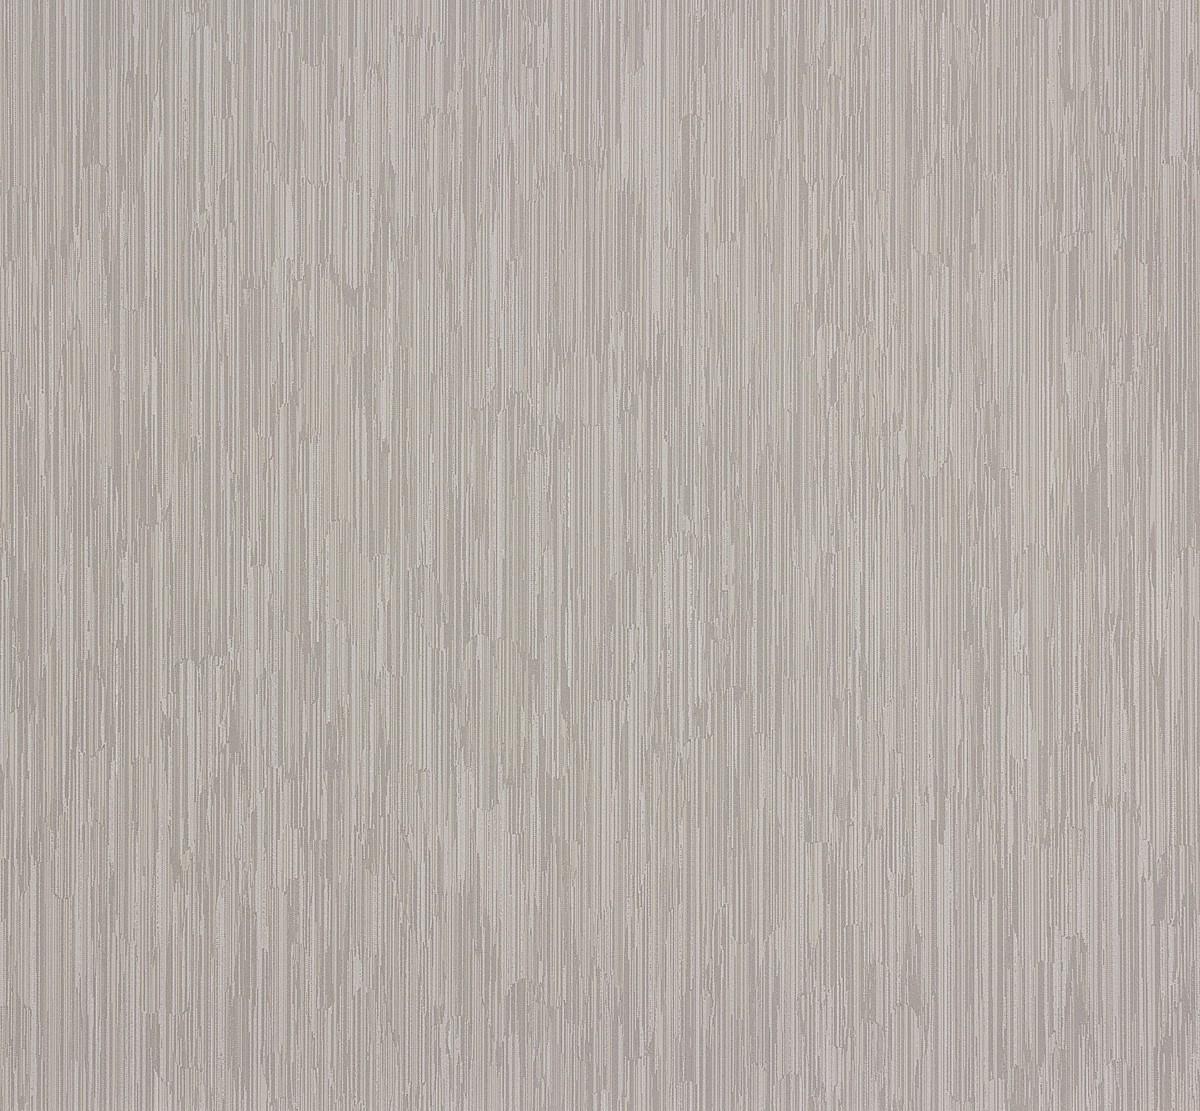 tapete vlies streifen grau beige marburg 56925. Black Bedroom Furniture Sets. Home Design Ideas